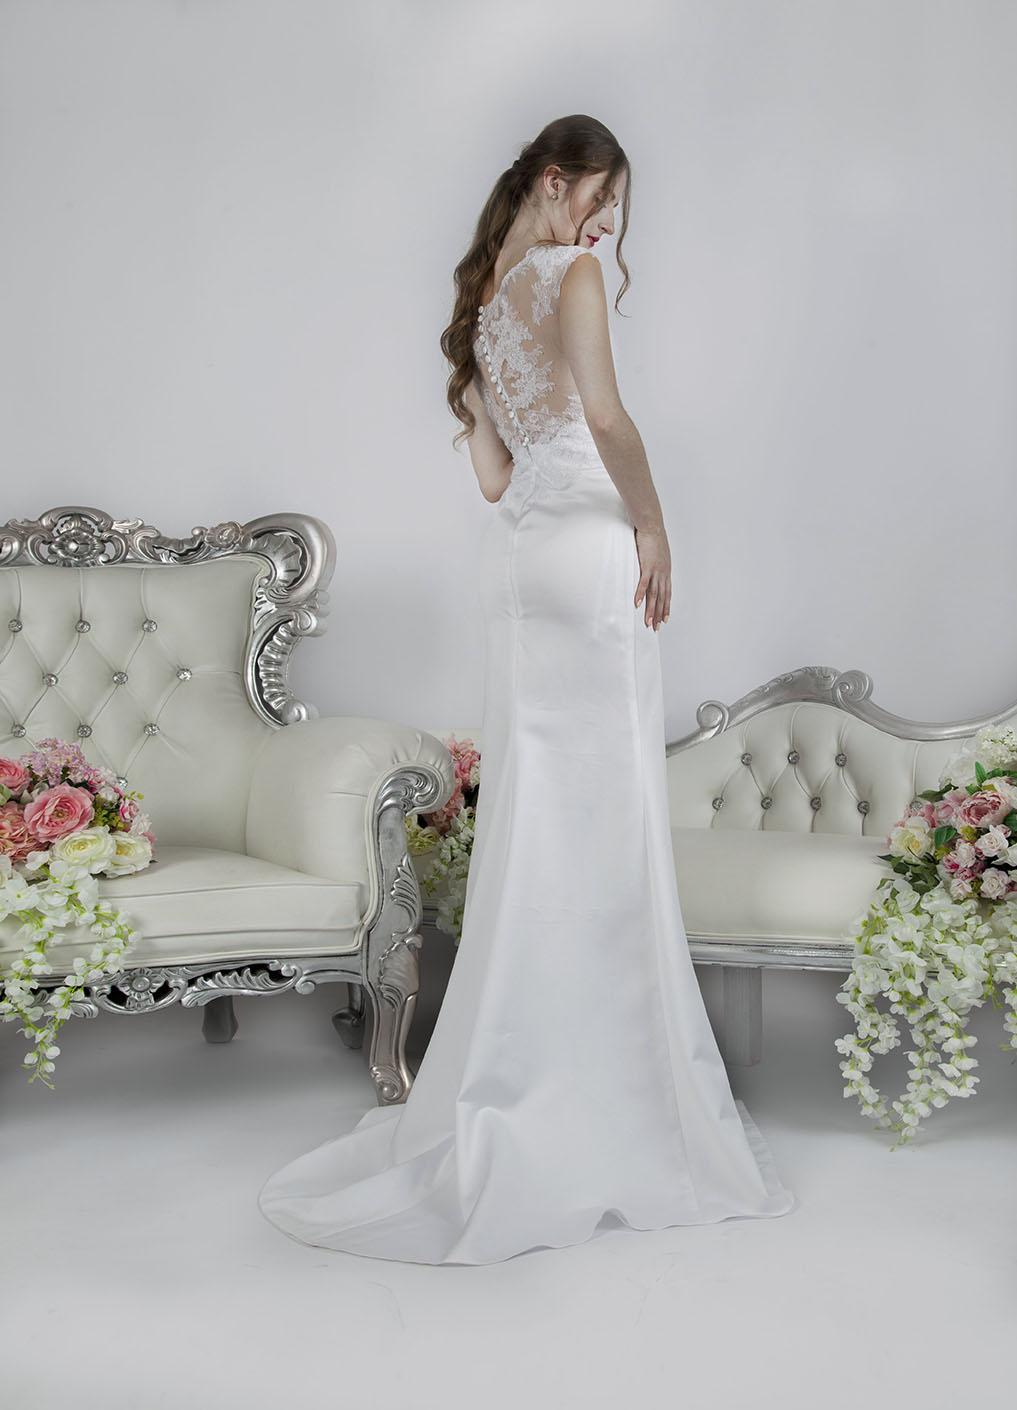 Robe de mariée sexy avec une fente